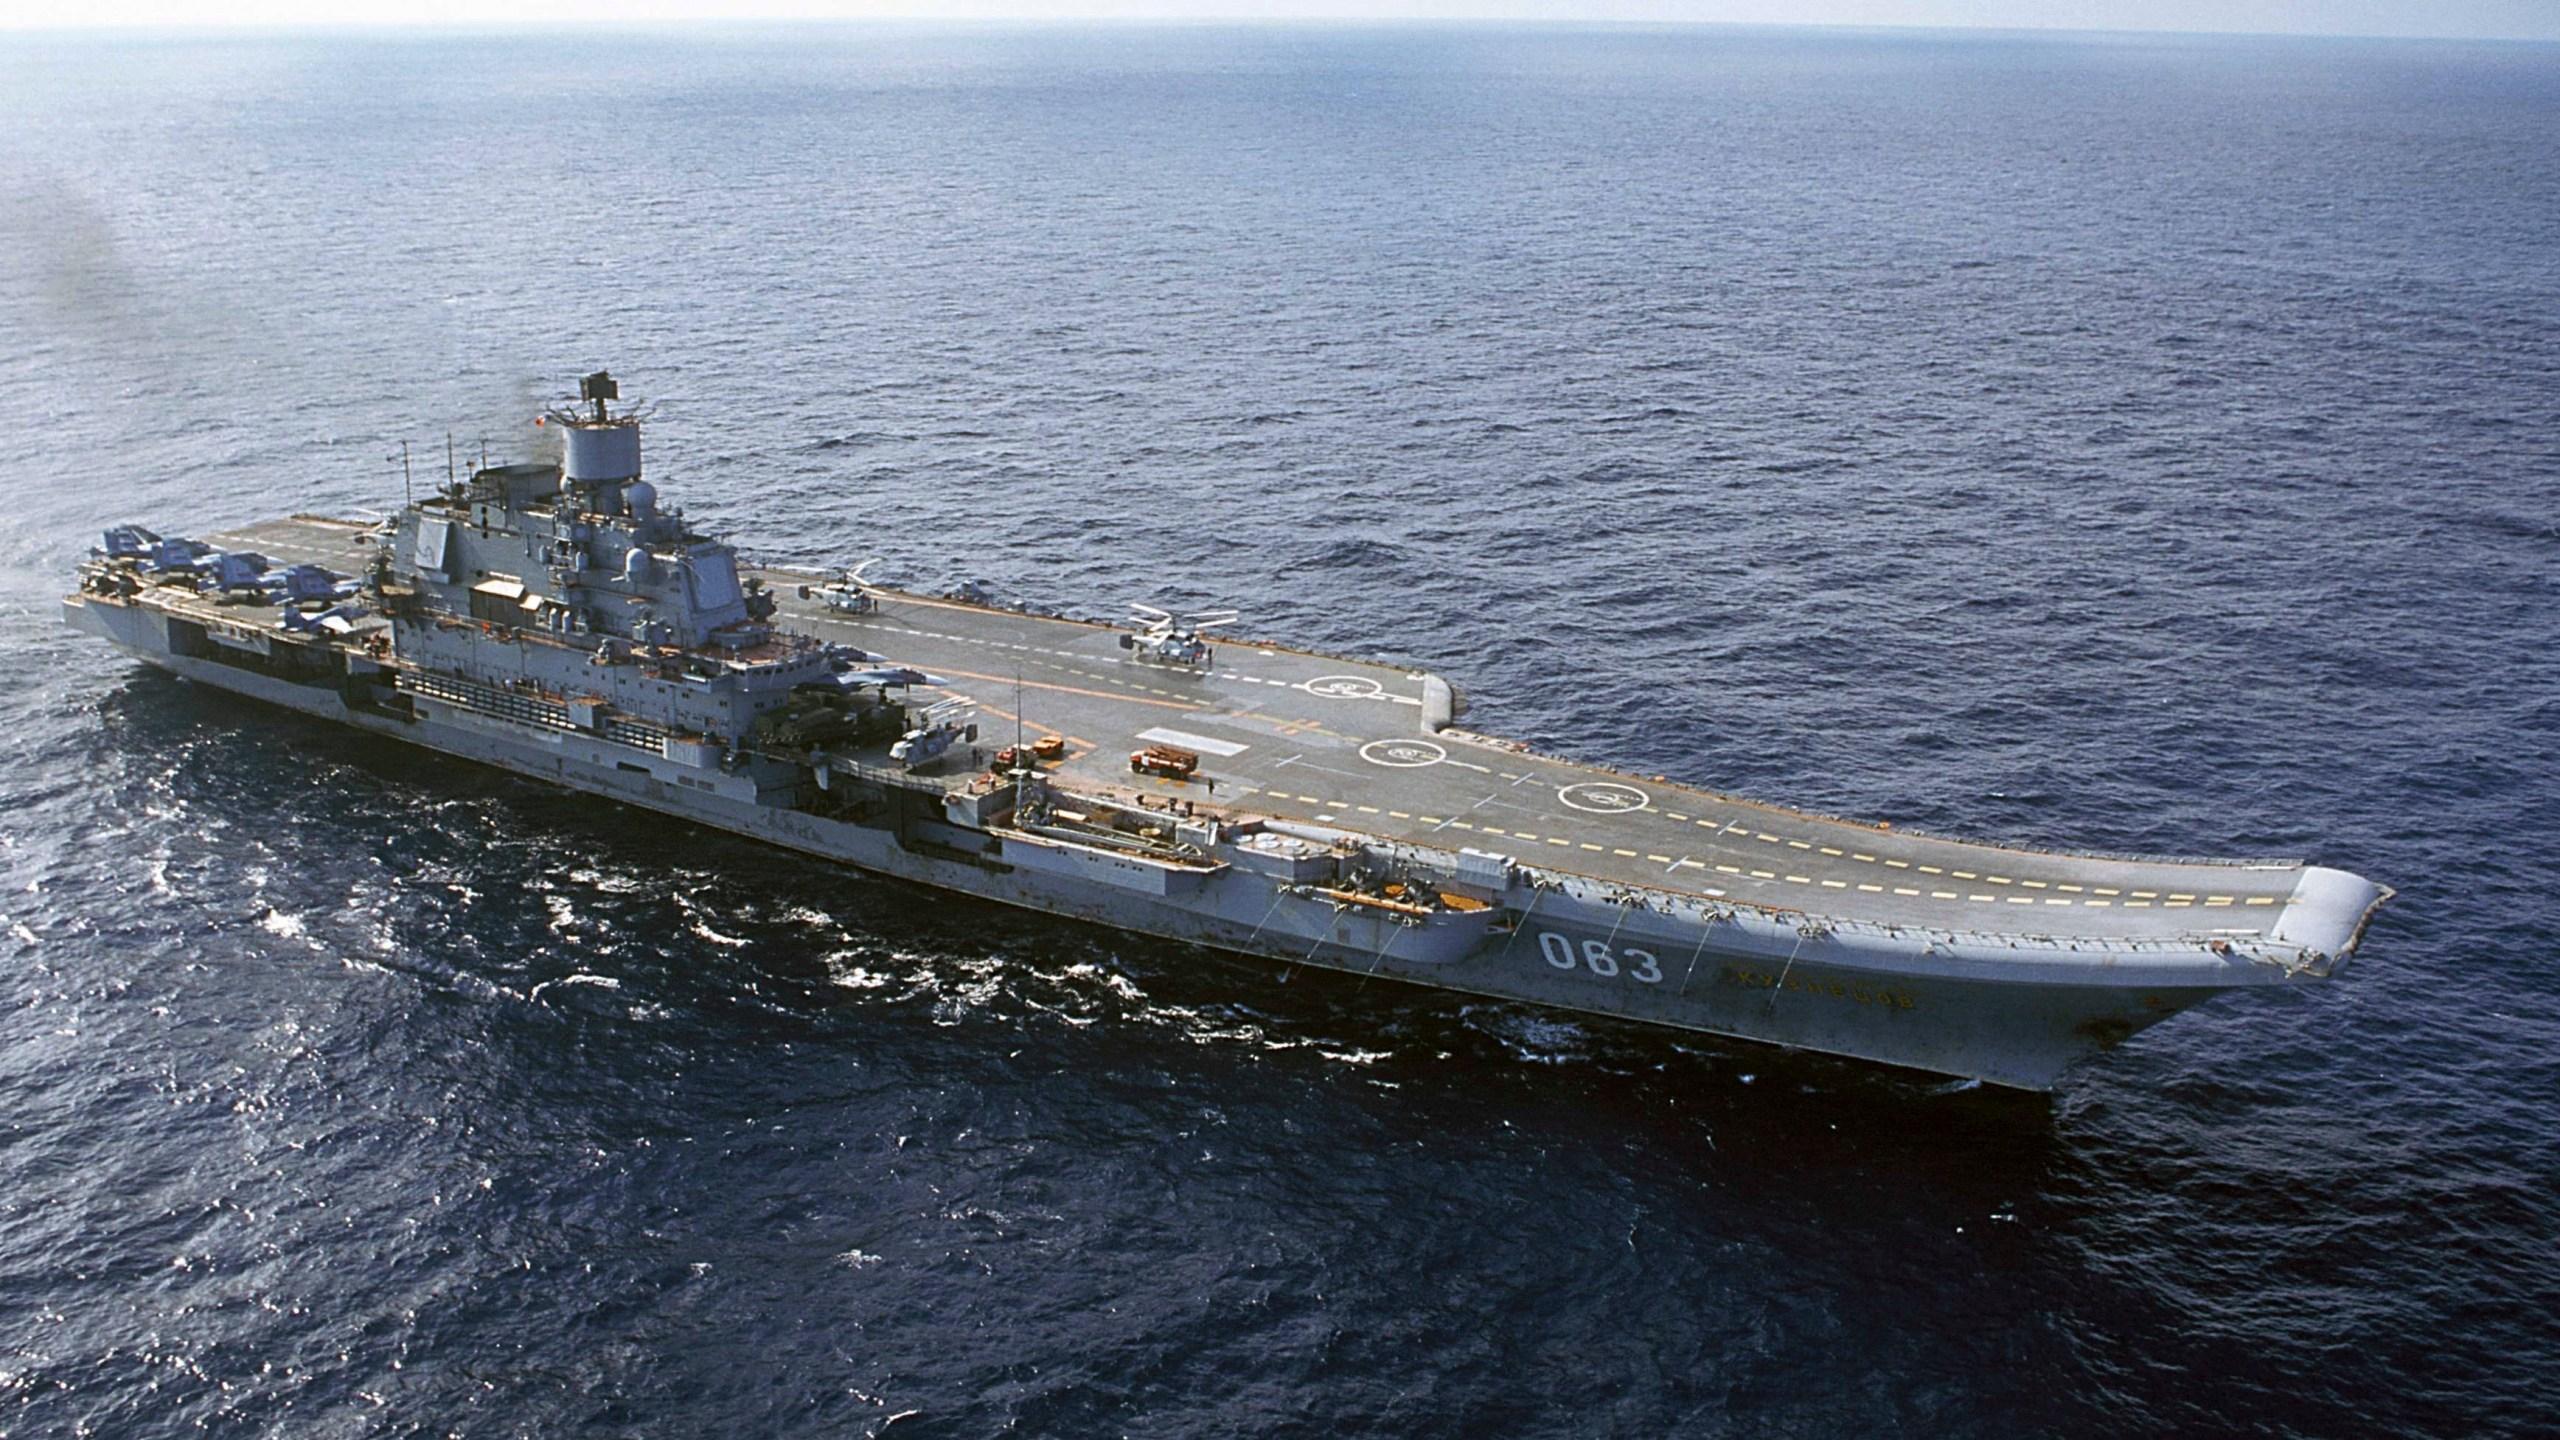 Admiral Kuznetsov carrier